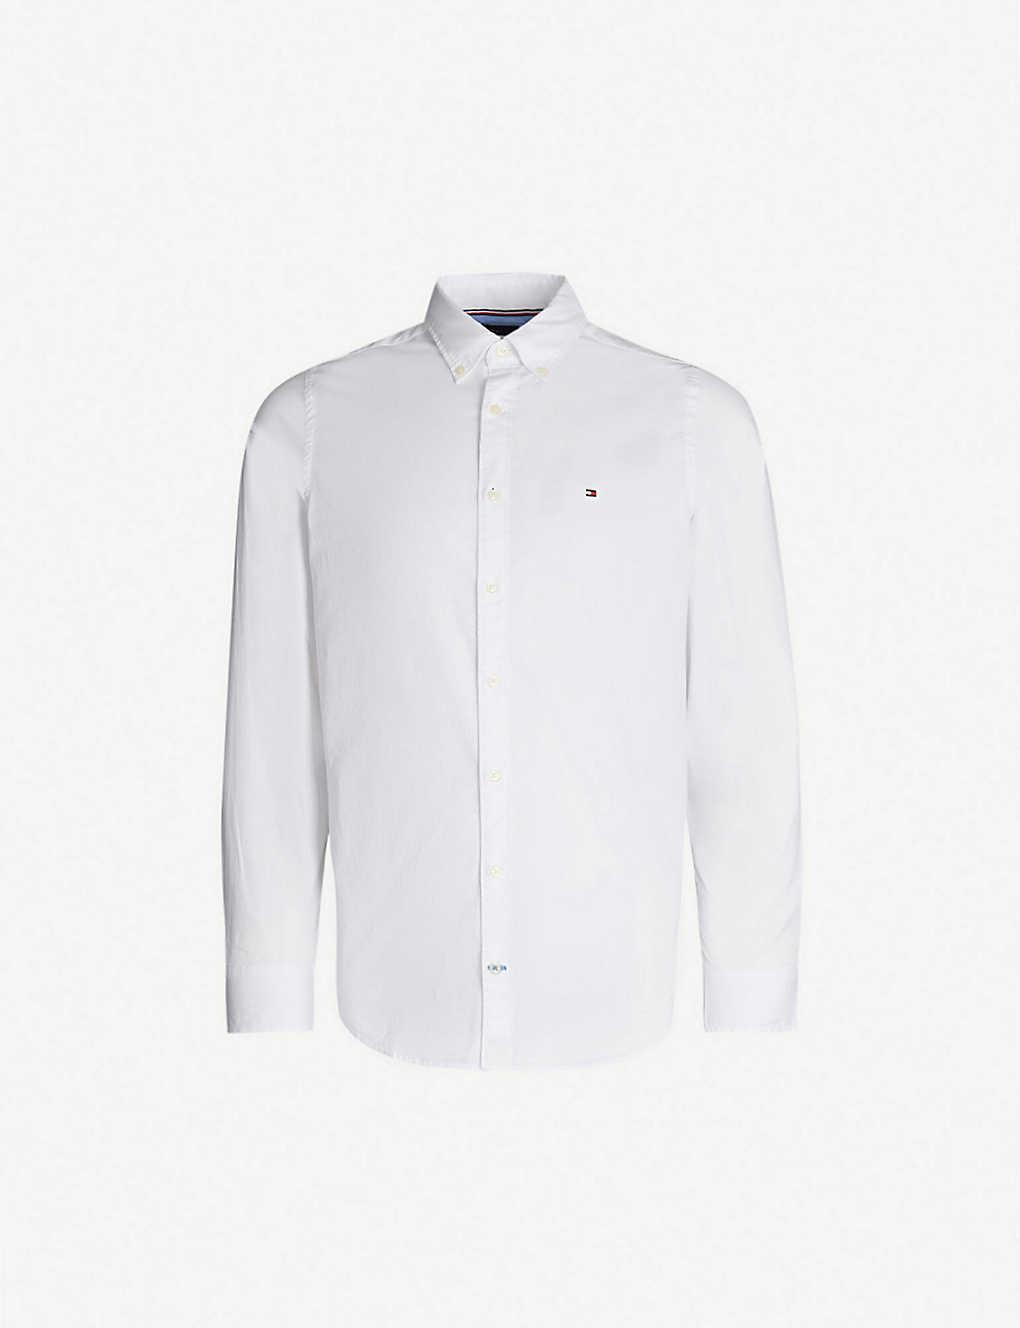 6f89dc7b TOMMY HILFIGER - Slim-fit stretch-cotton shirt | Selfridges.com